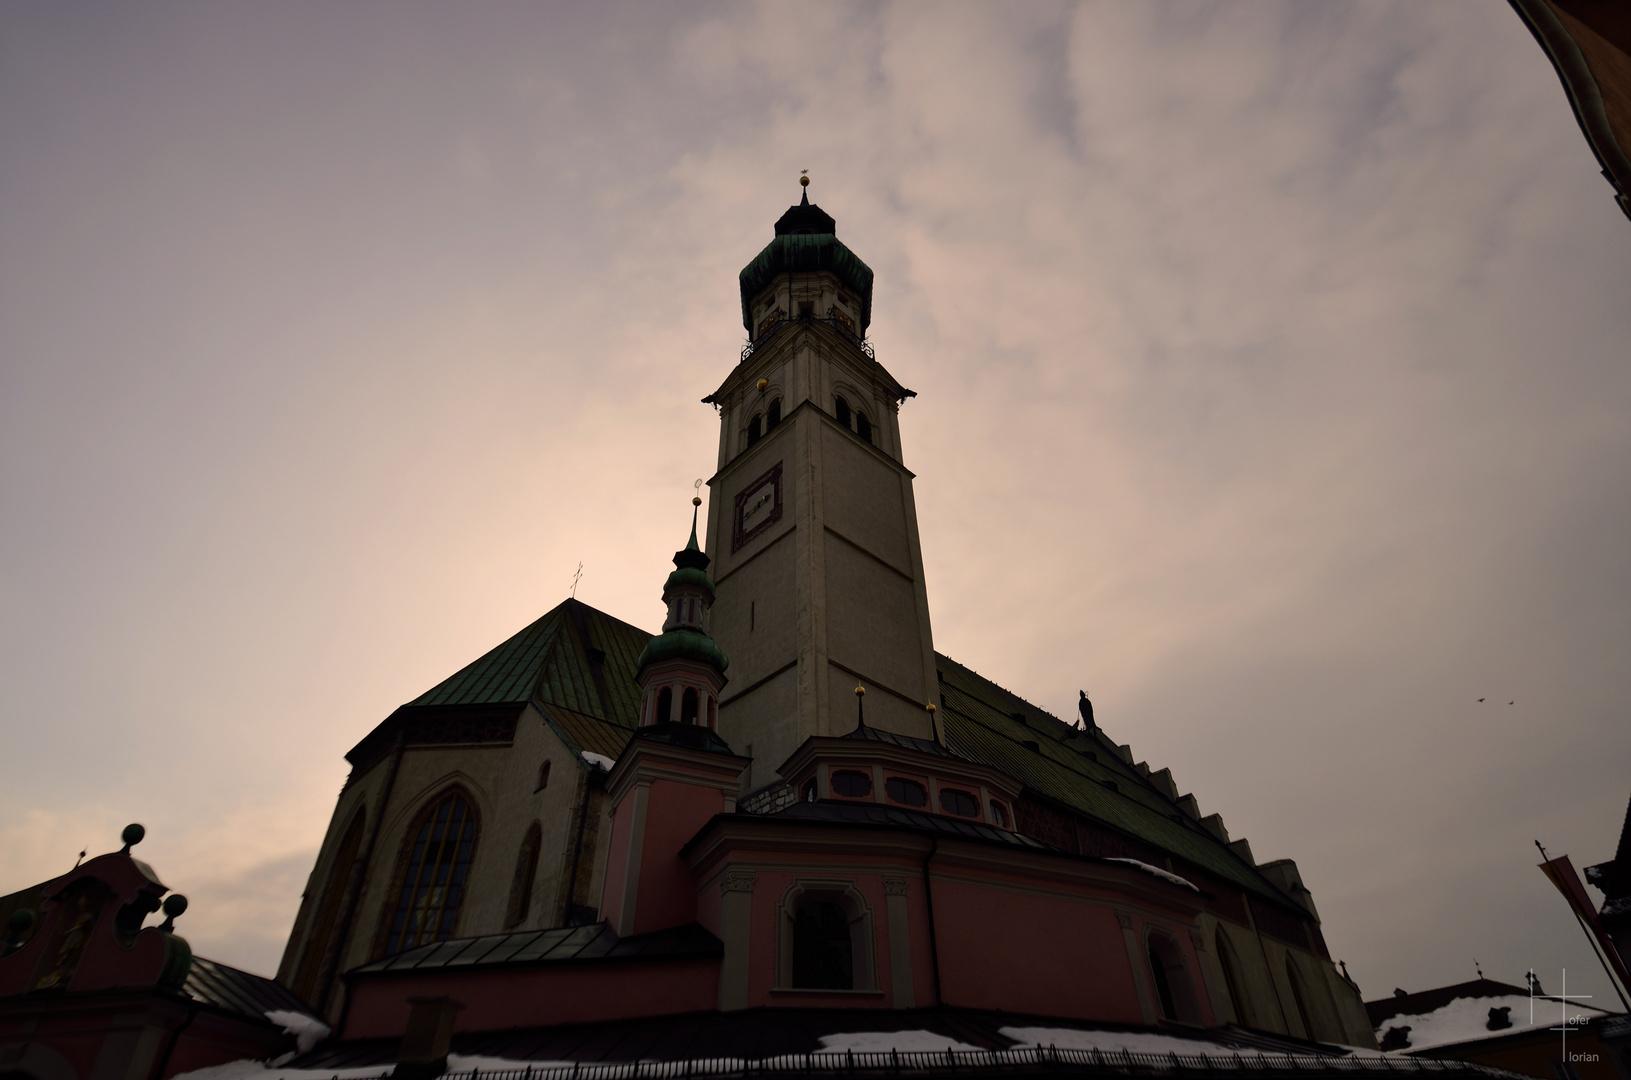 Pfarkirche Hall in Tirol